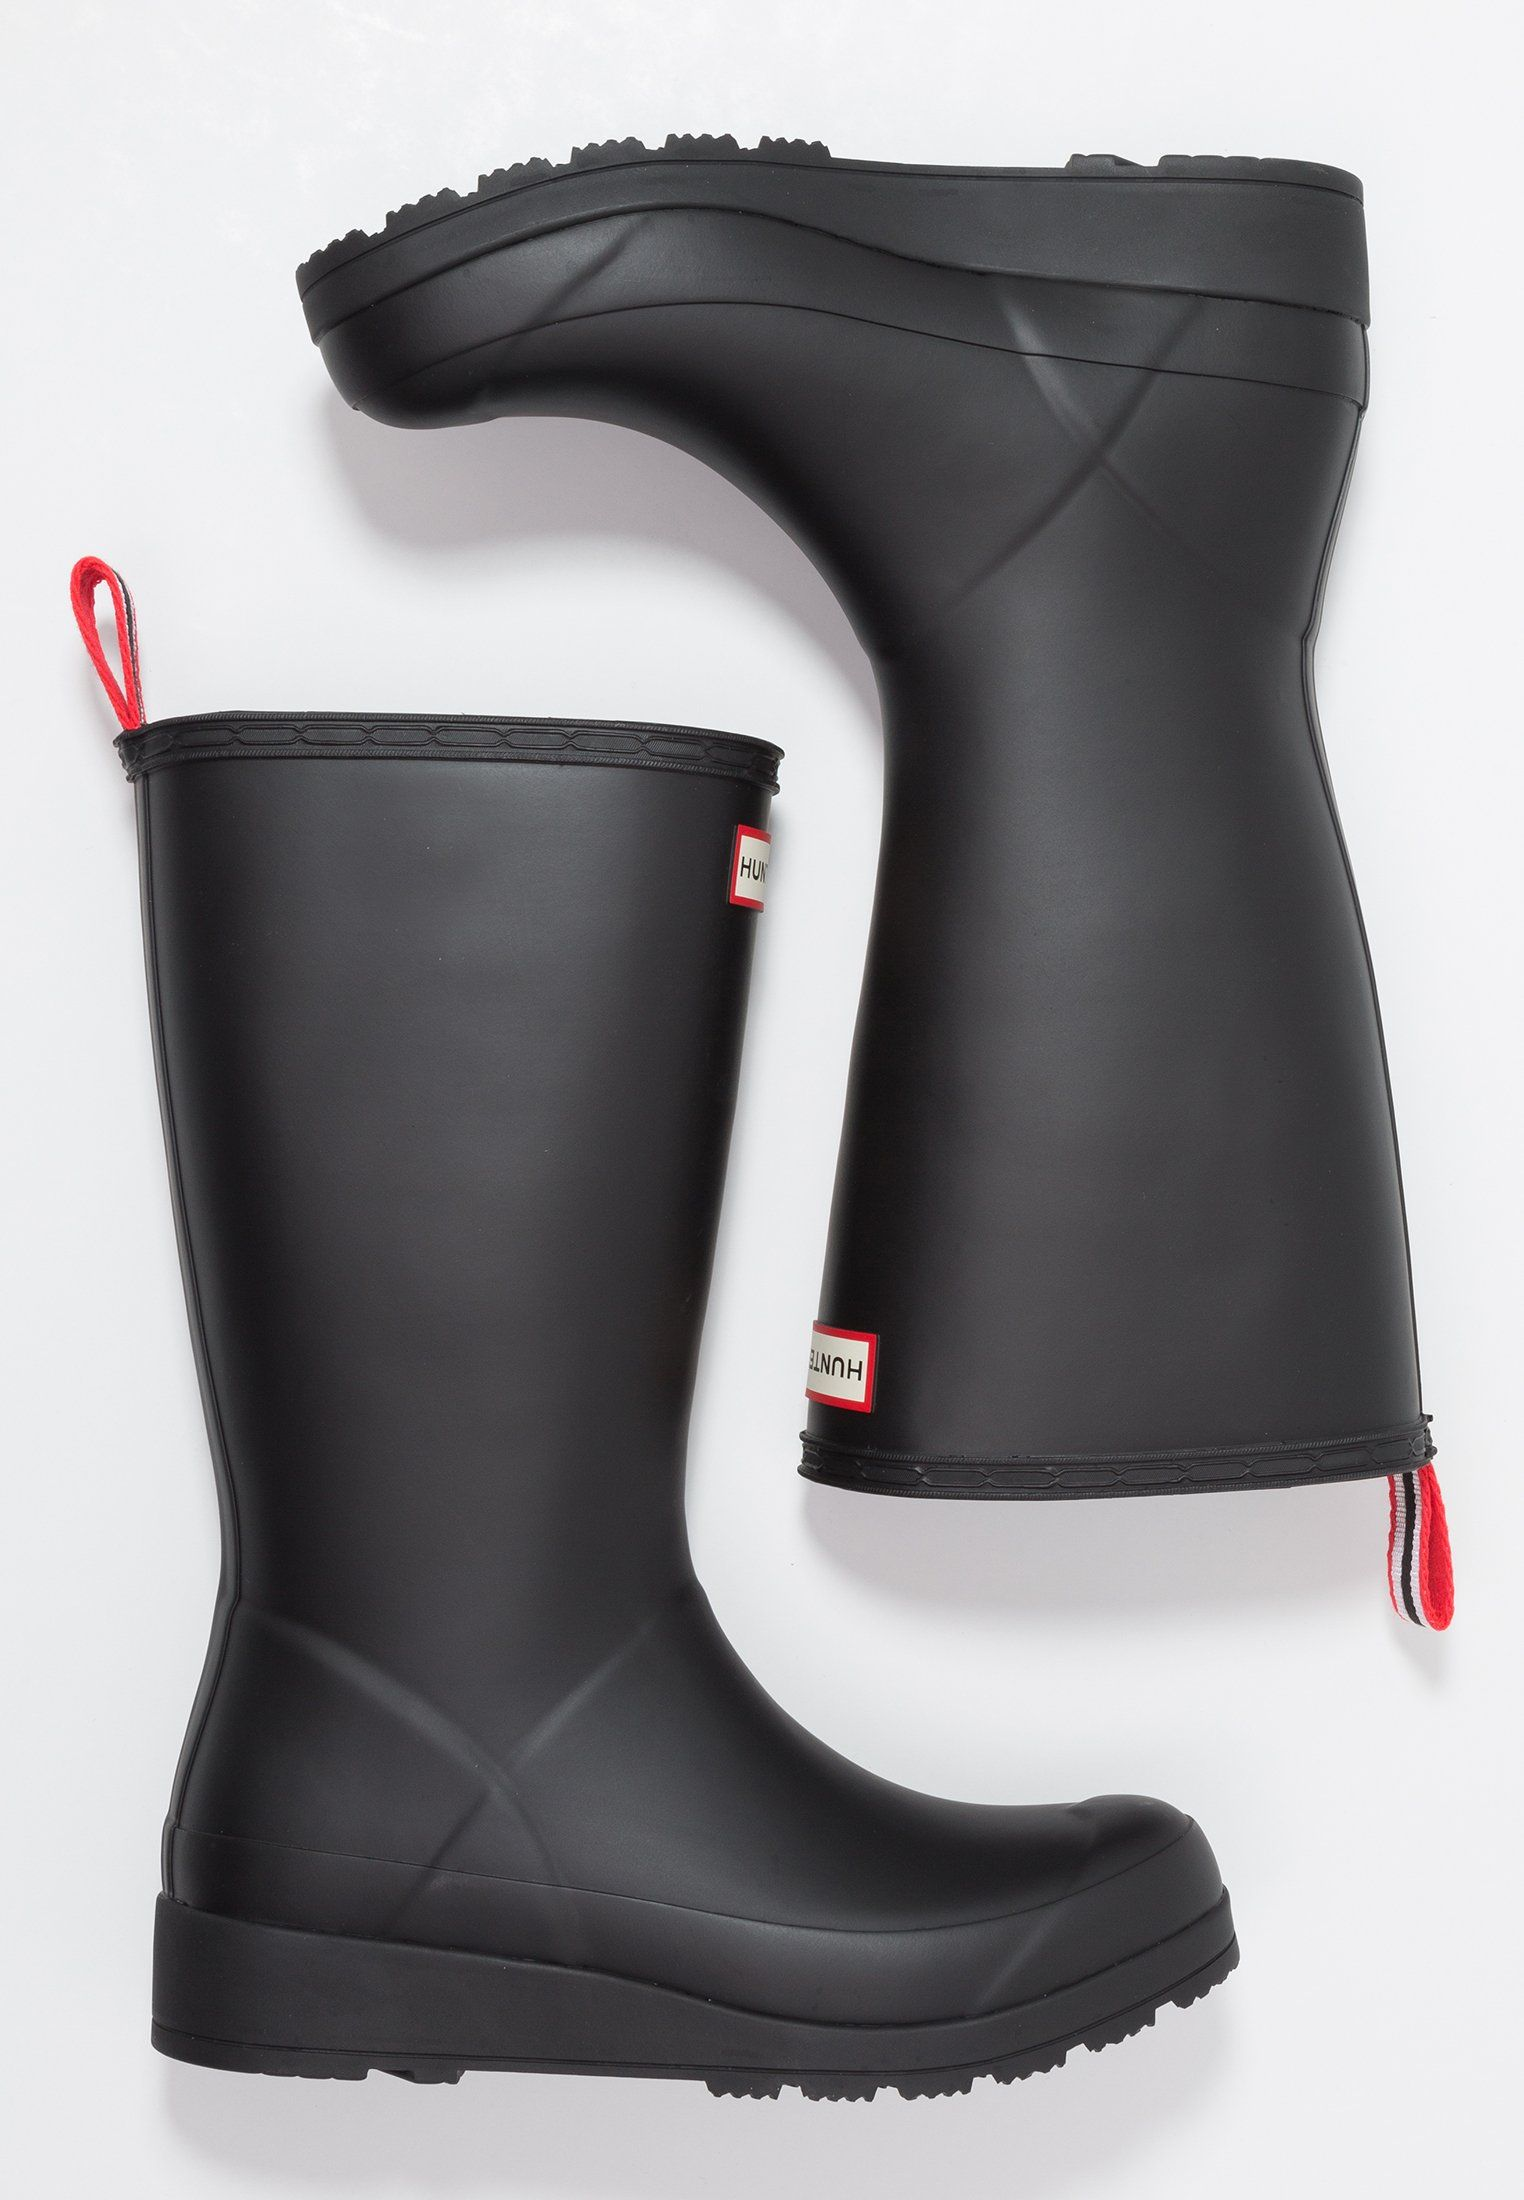 69c048064381 ORIGINAL PLAYBOOT TALL - Gummistiefel - black   Shoes   Pinterest ...